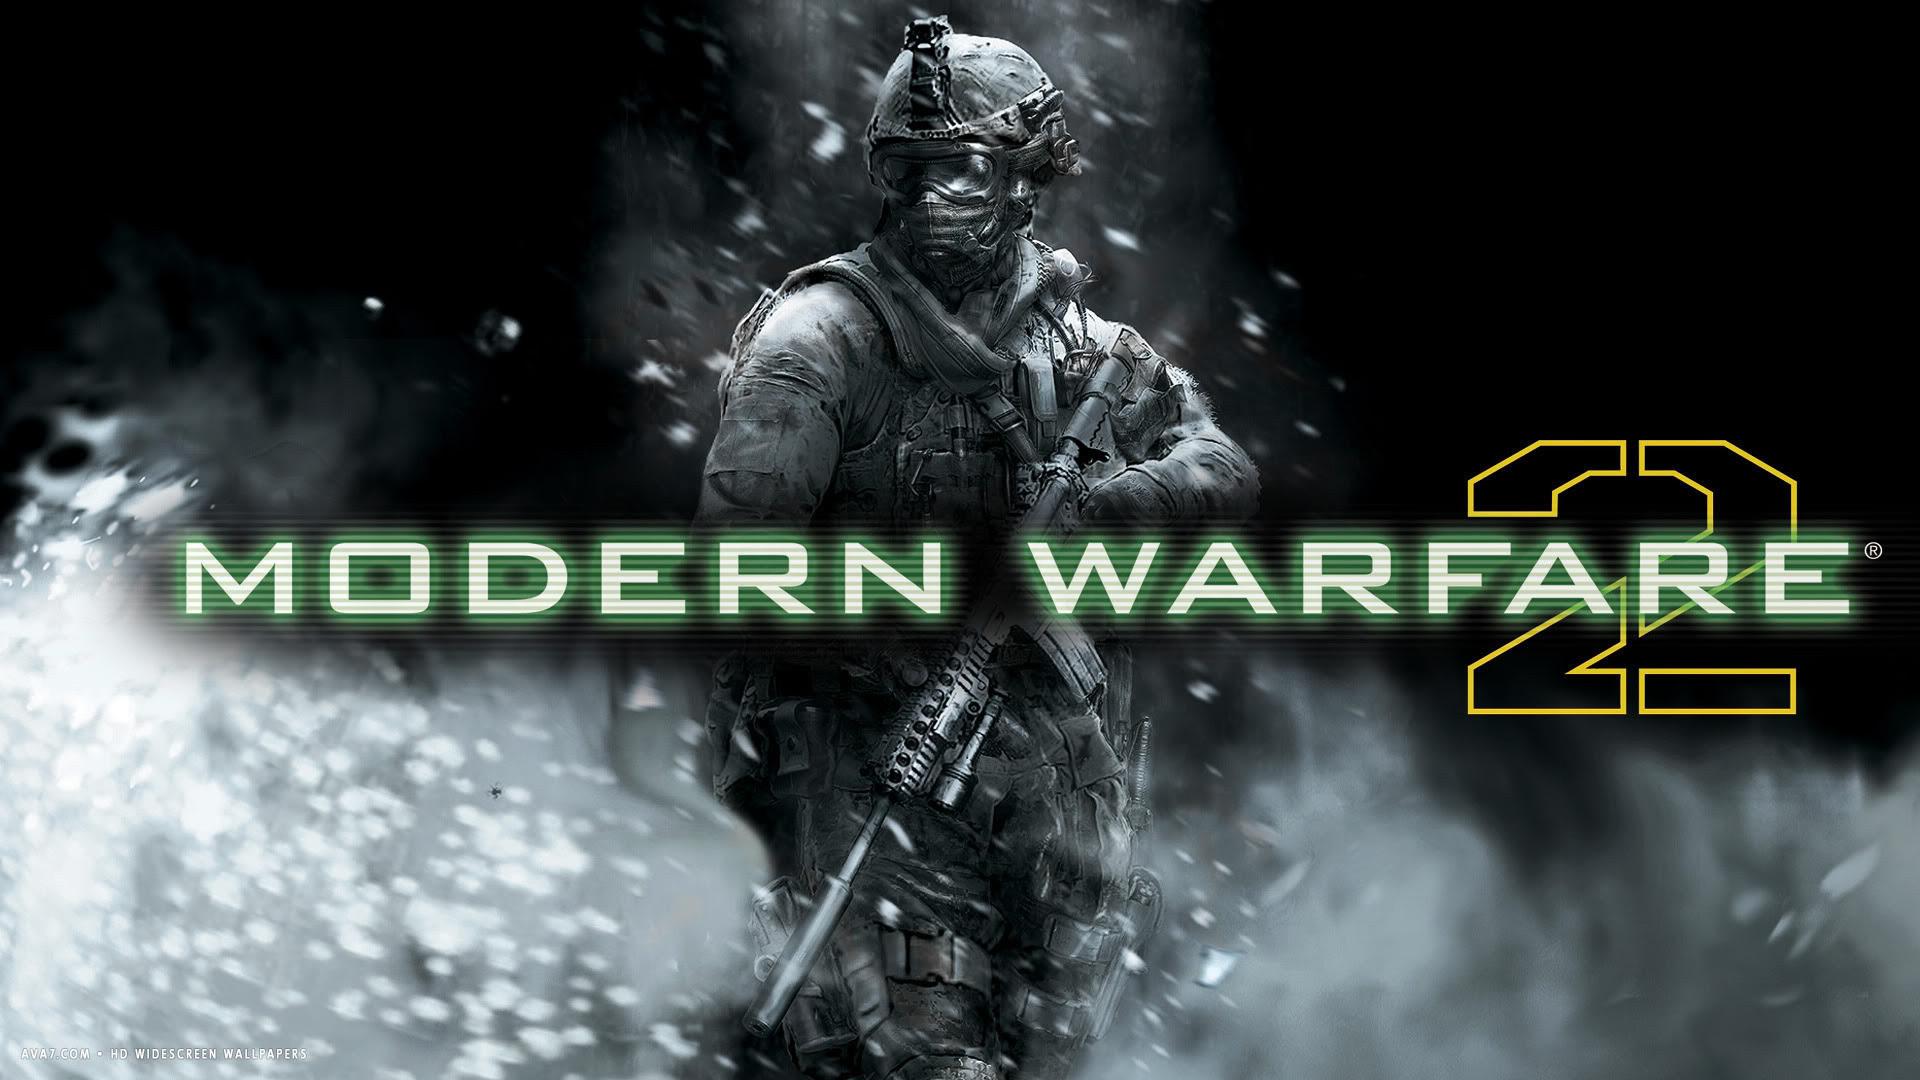 Call Of Duty Modern Warfare 2 Game Hd Widescreen Wallpaper Games